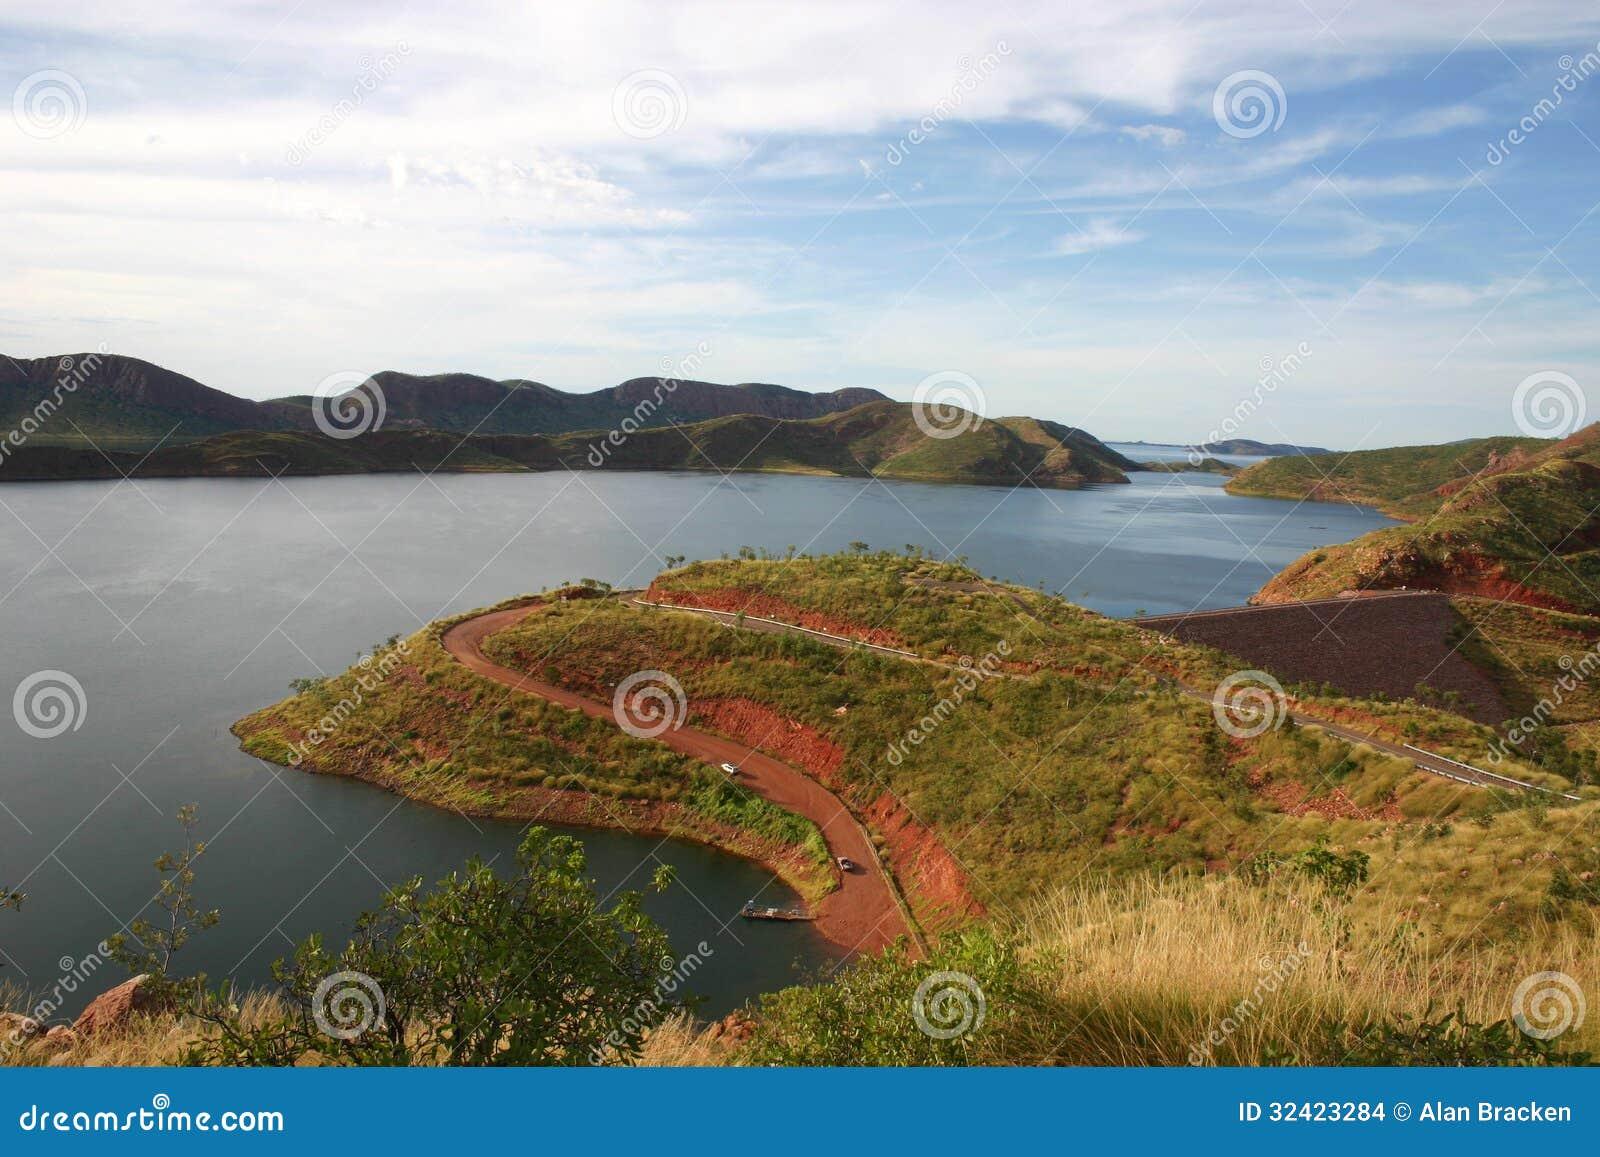 Kununurra Australia  city photos gallery : Overlooking Lake Argle, Kununurra, Western Australia Stock Images ...